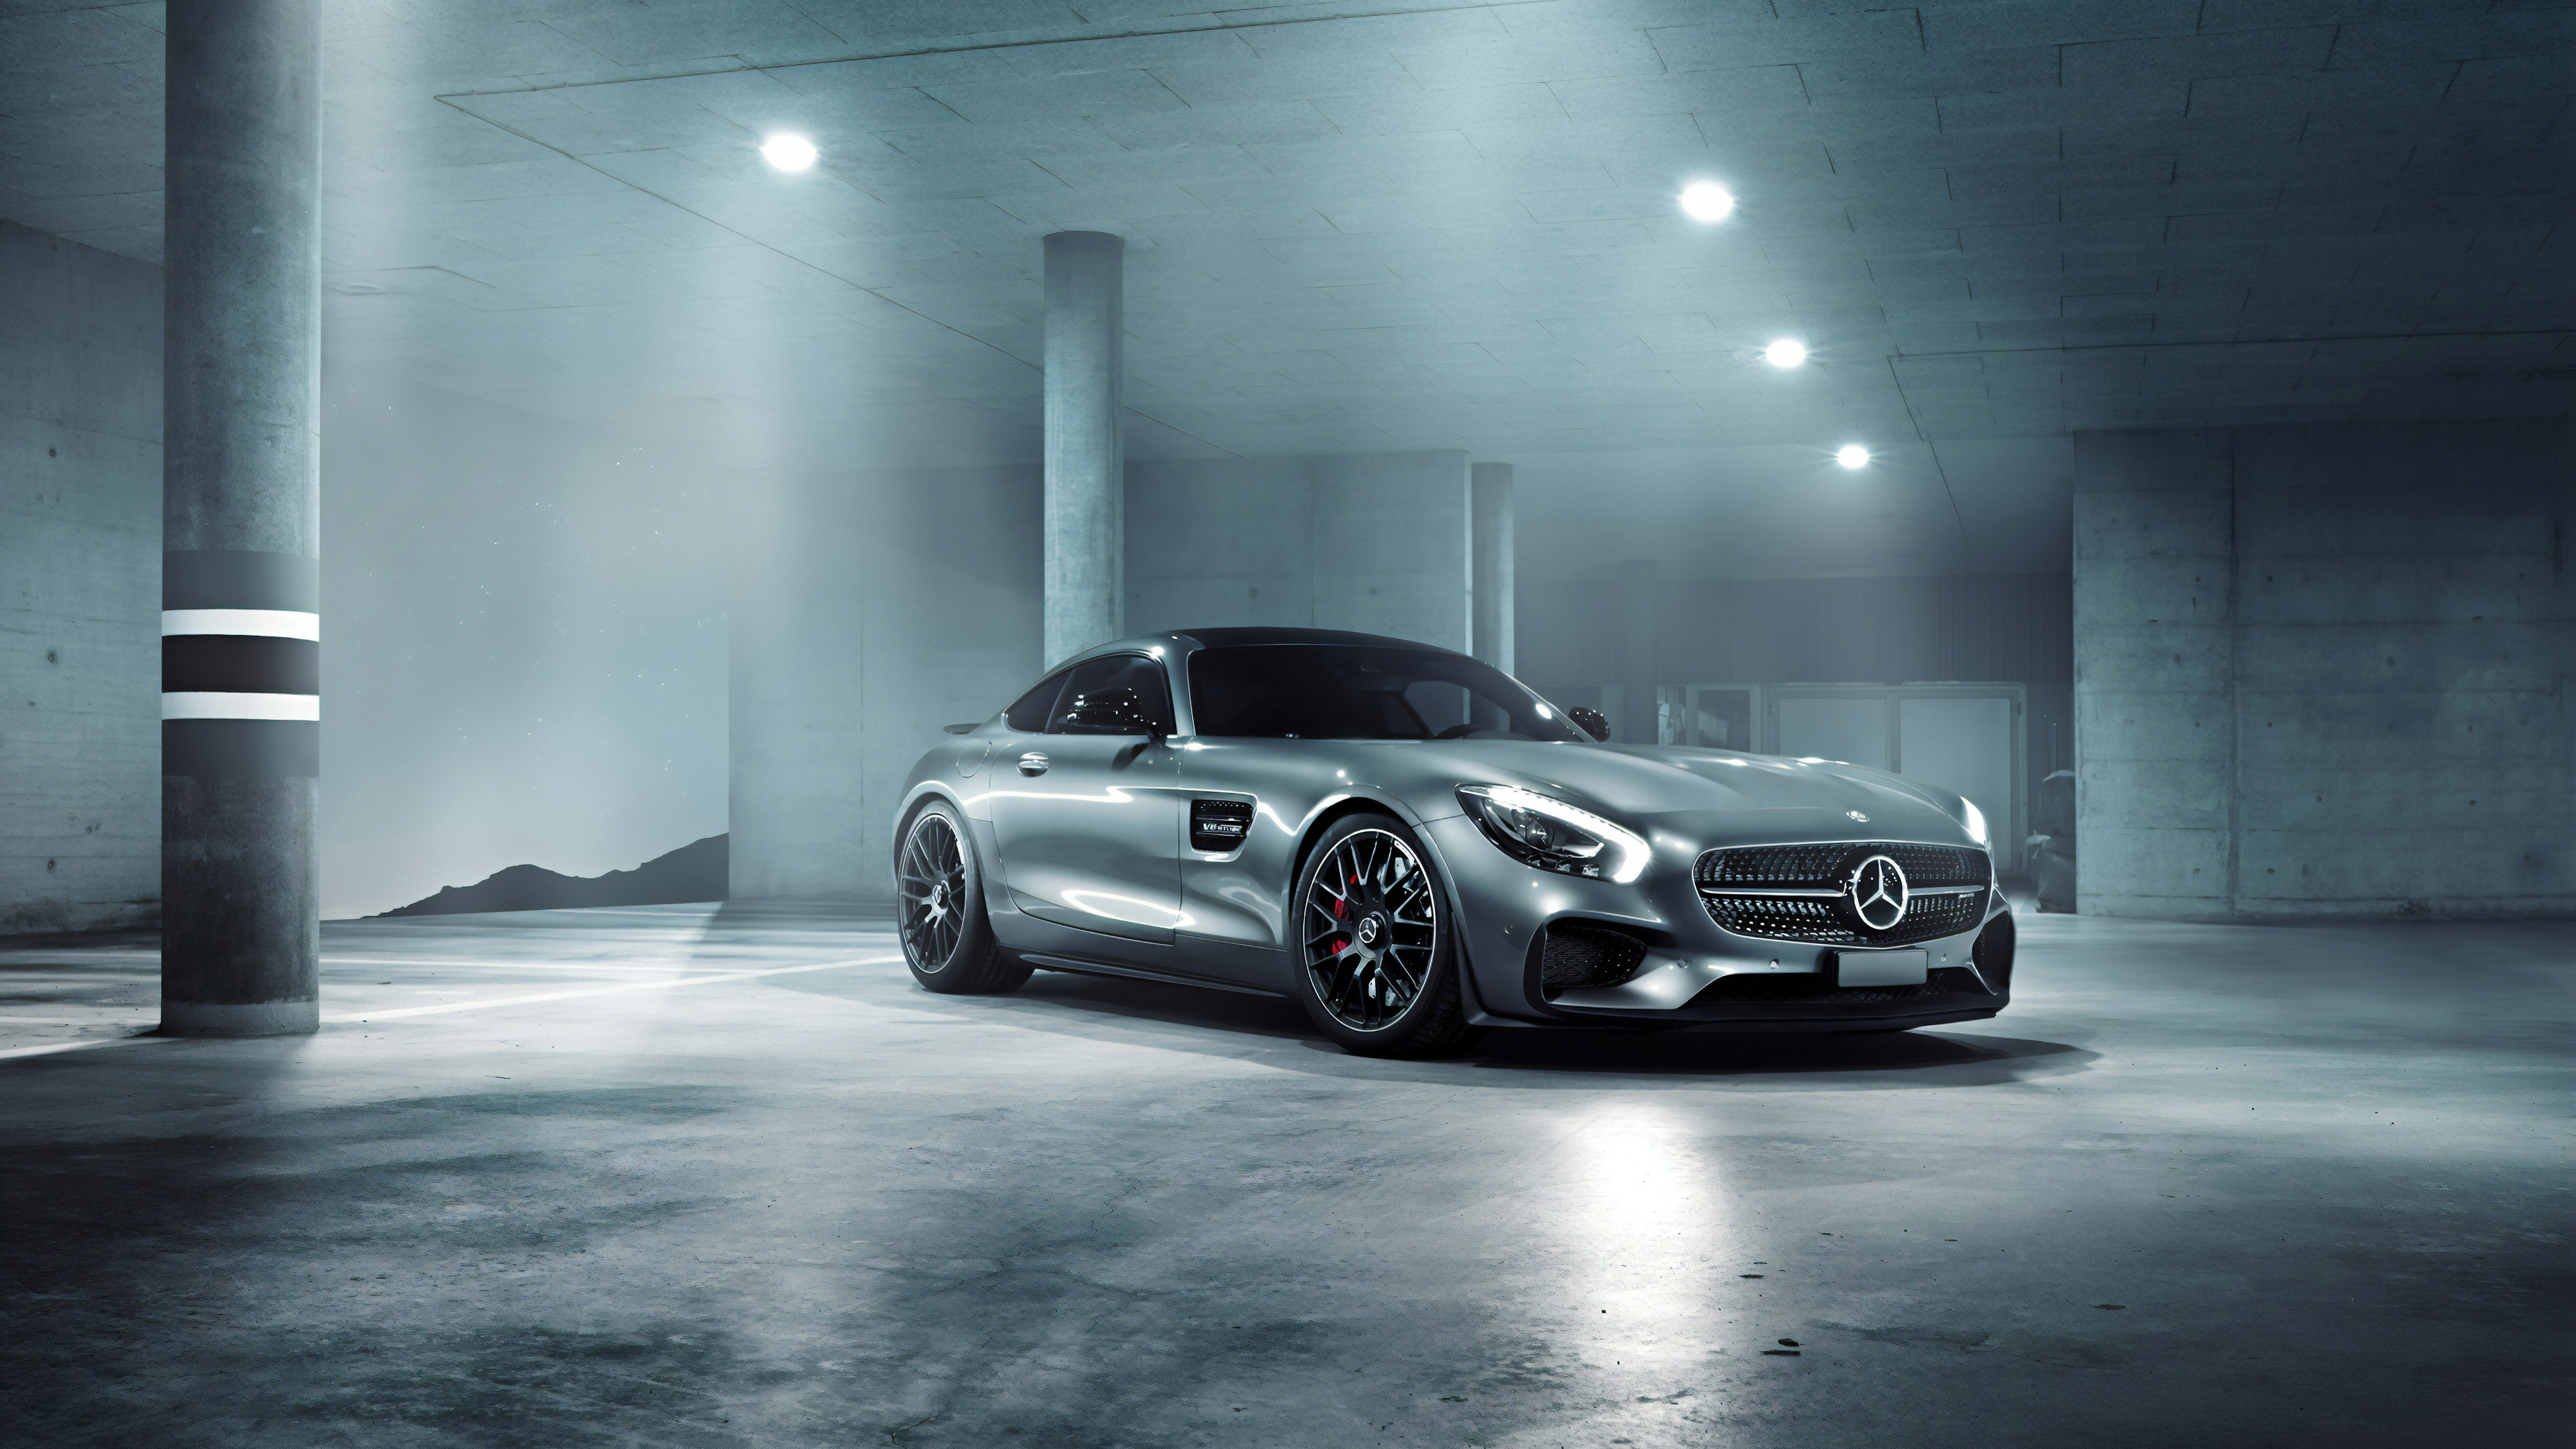 grey mercedes benz amg gt 1562108049 - Grey Mercedes Benz Amg GT - mercedes wallpapers, mercedes amg gtr wallpapers, hd-wallpapers, cars wallpapers, behance wallpapers, 4k-wallpapers, 2019 cars wallpapers